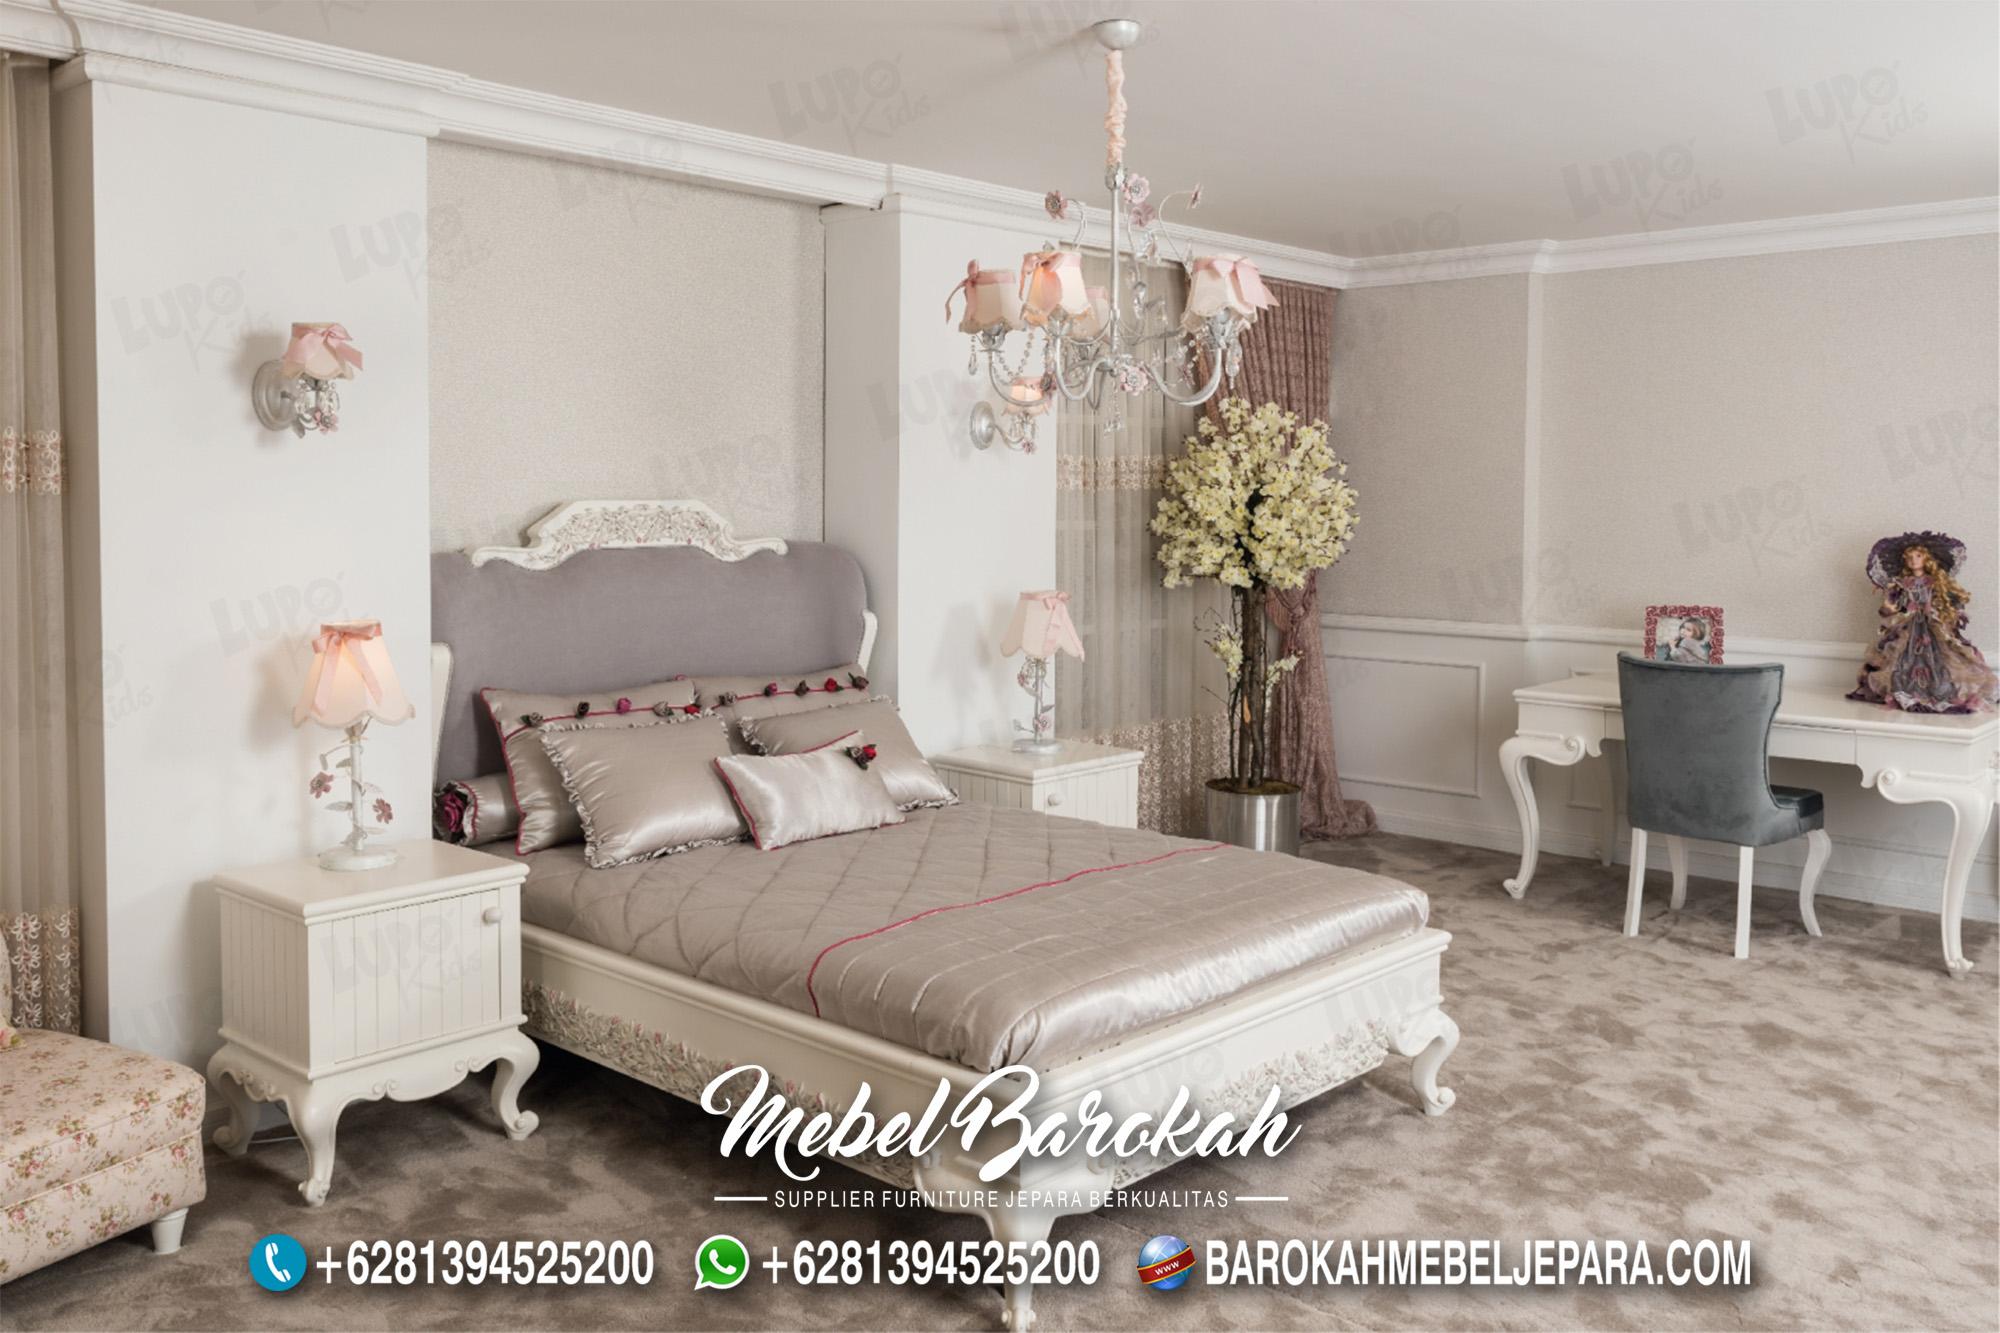 Desain Interior Kamar Anak Ukir Jepara MB-592